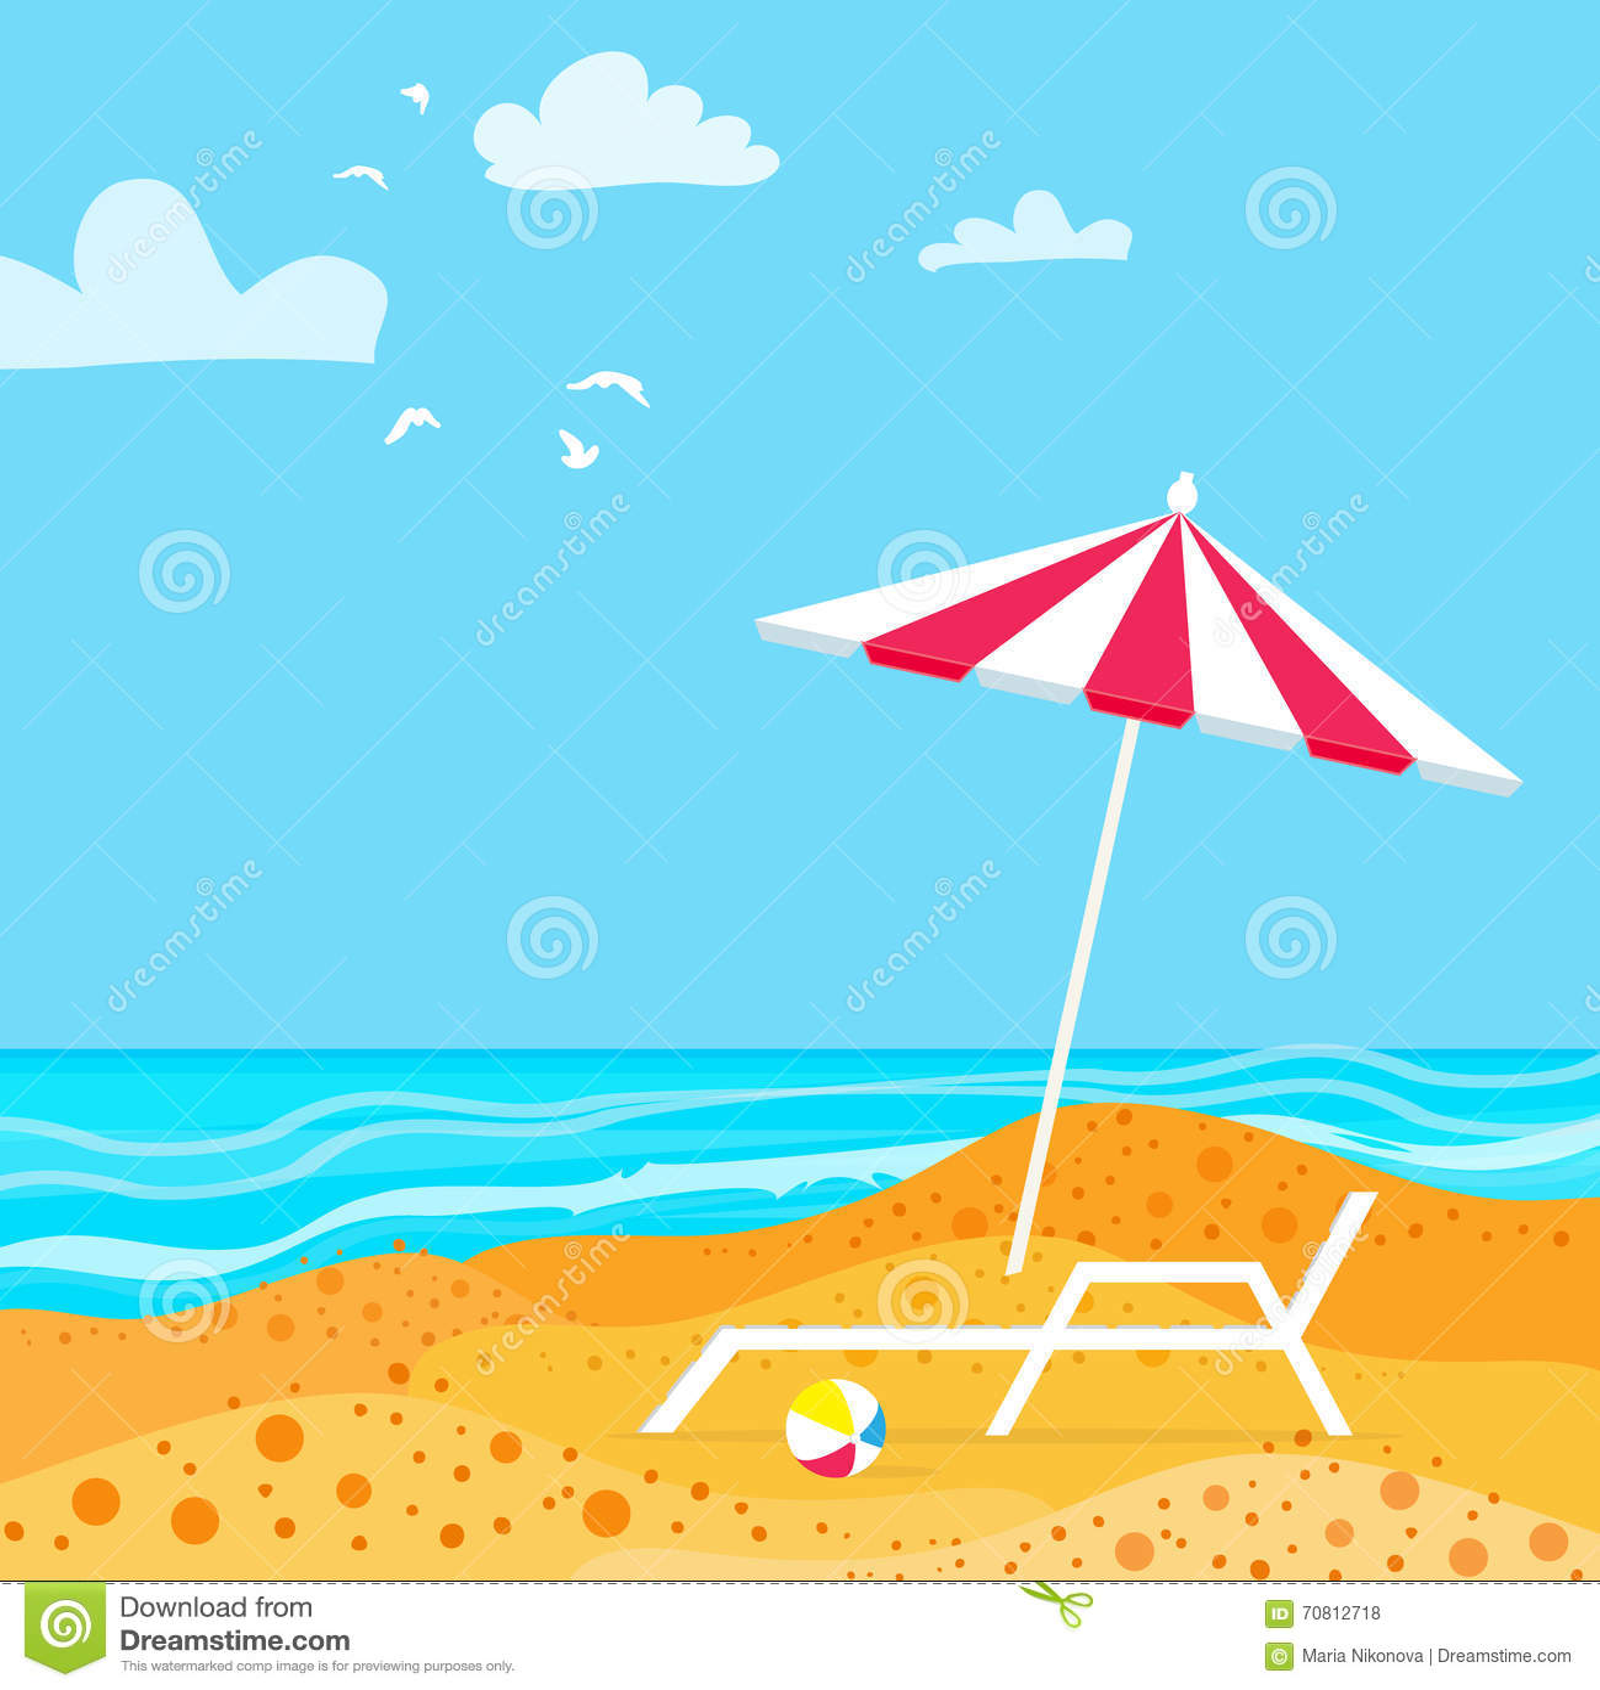 Chaise Lounge With Parasol Umbrella Ocean Summer Resort